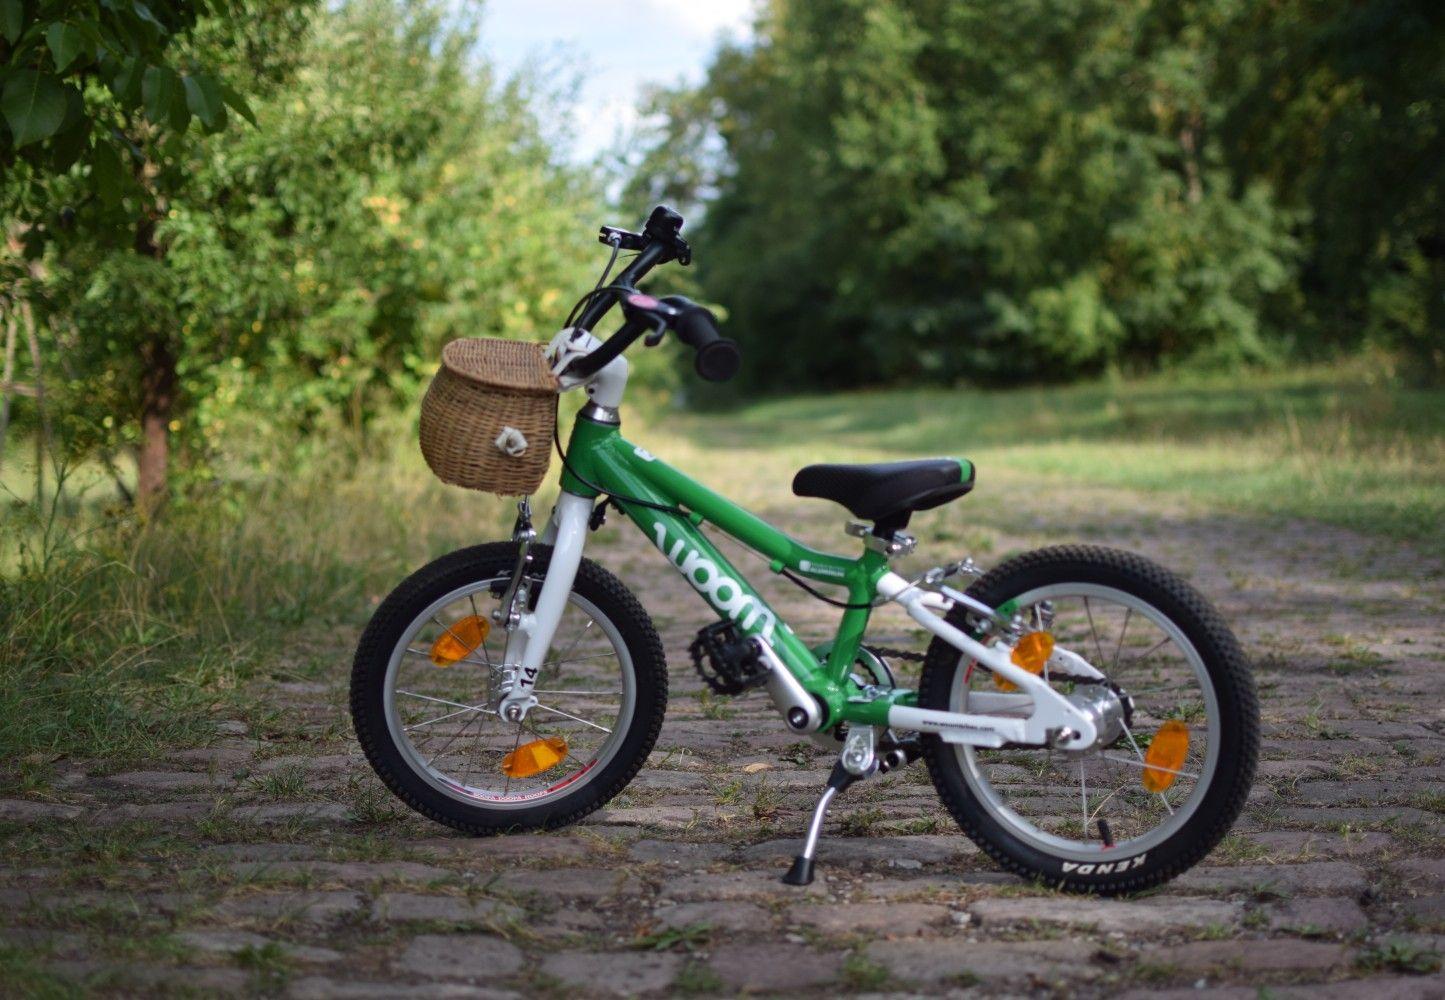 Woom 2 Radfahren Fahrrad Laufrad